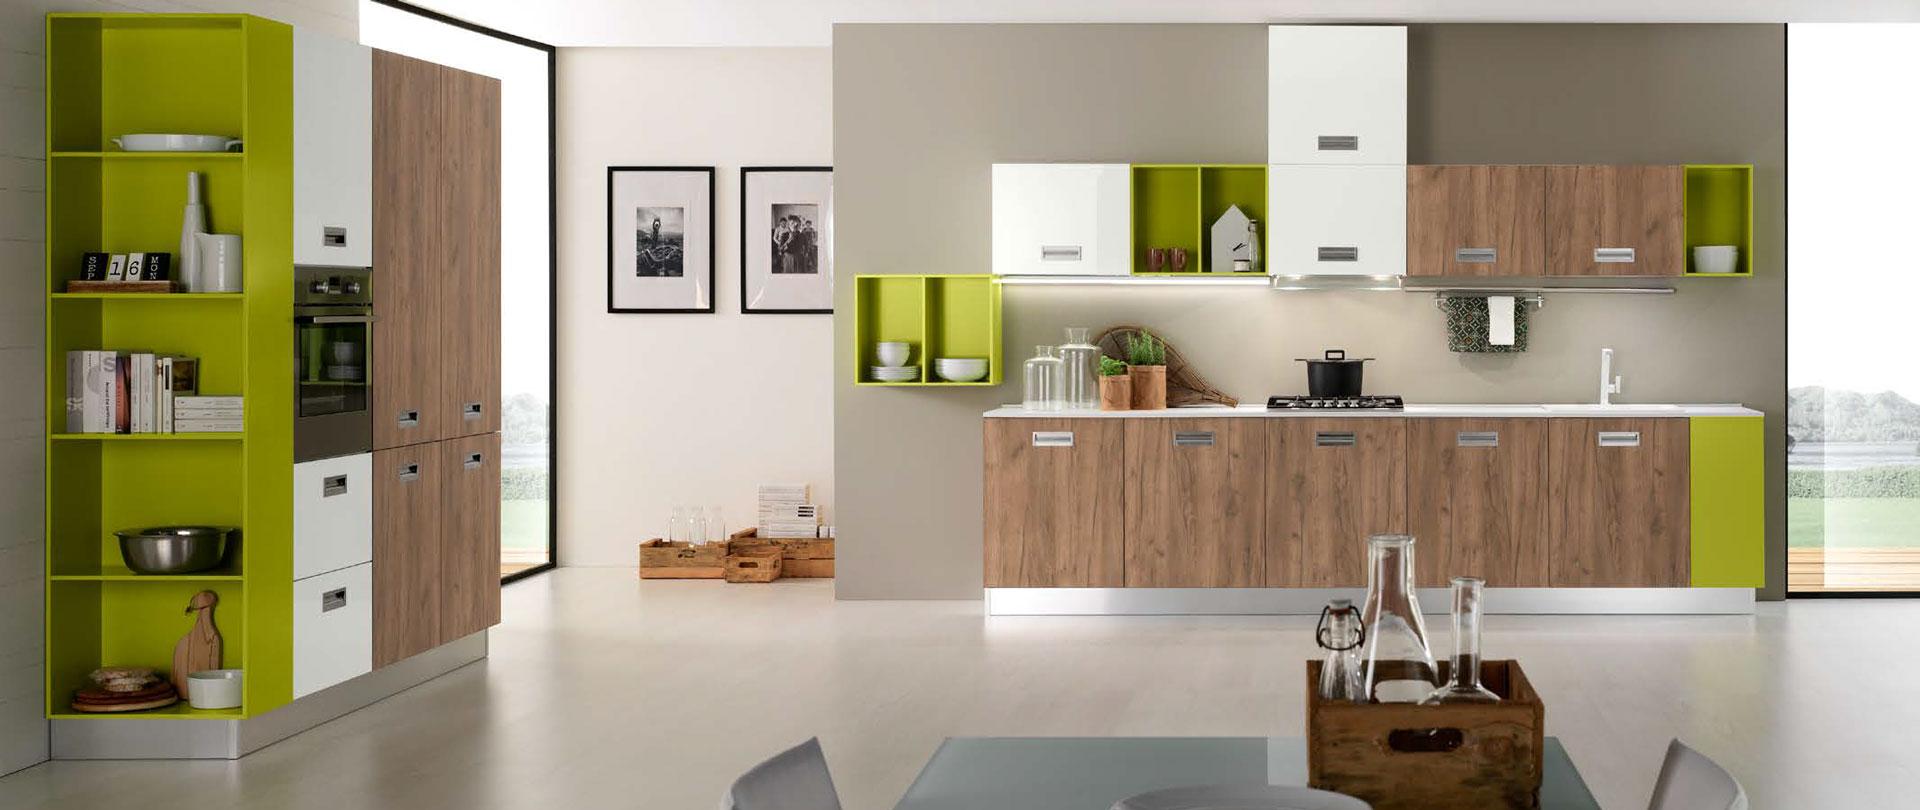 Nevada cucina moderna mobilturi arredi 2000 for Programma per comporre cucine